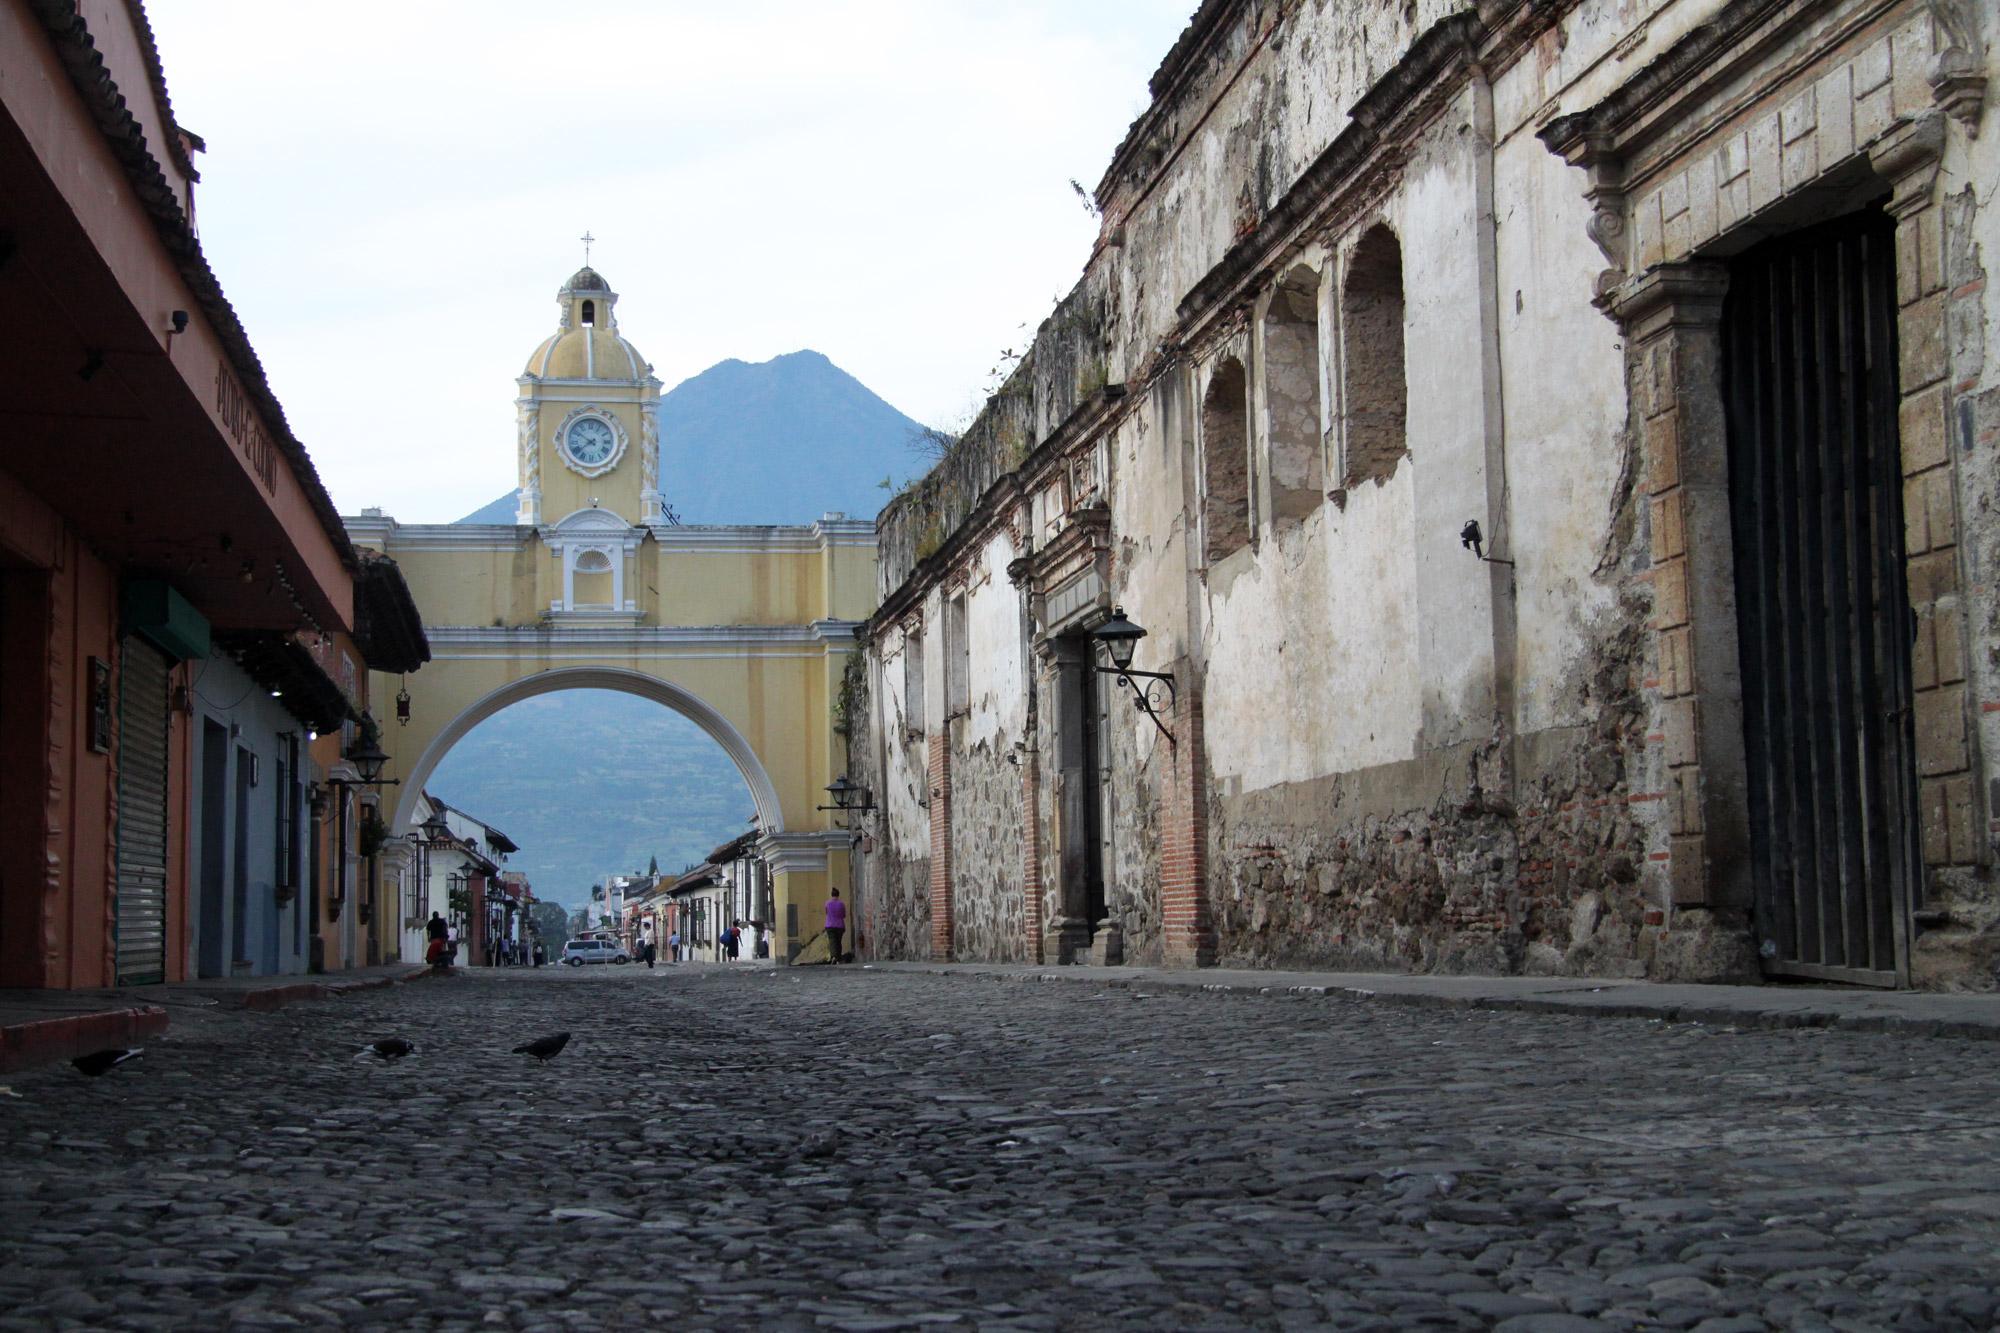 Guatemala 2015 - dag 2 - De Arco de Santa Catalina in Antigua